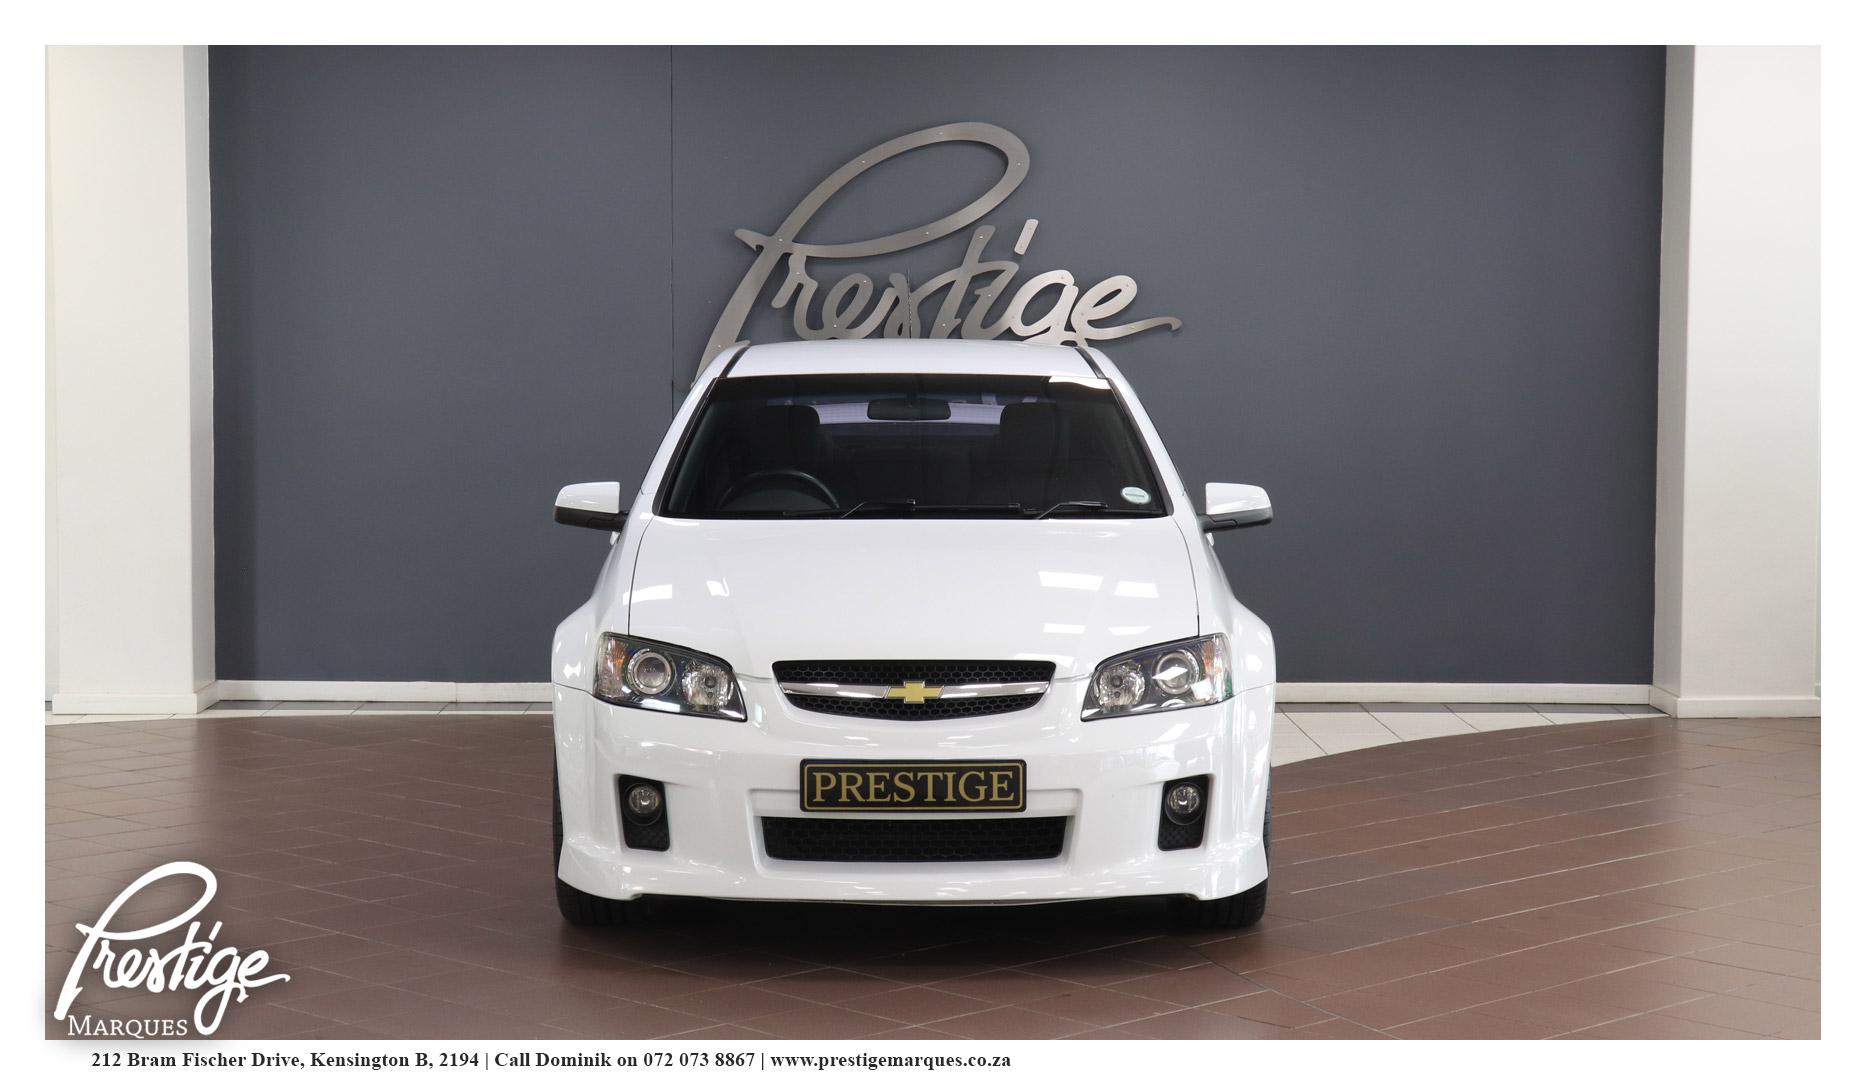 2008-Chevrolet-Lumina-SS-5.4-Manual-Prestige-Marques-Randburg-Sandton-9